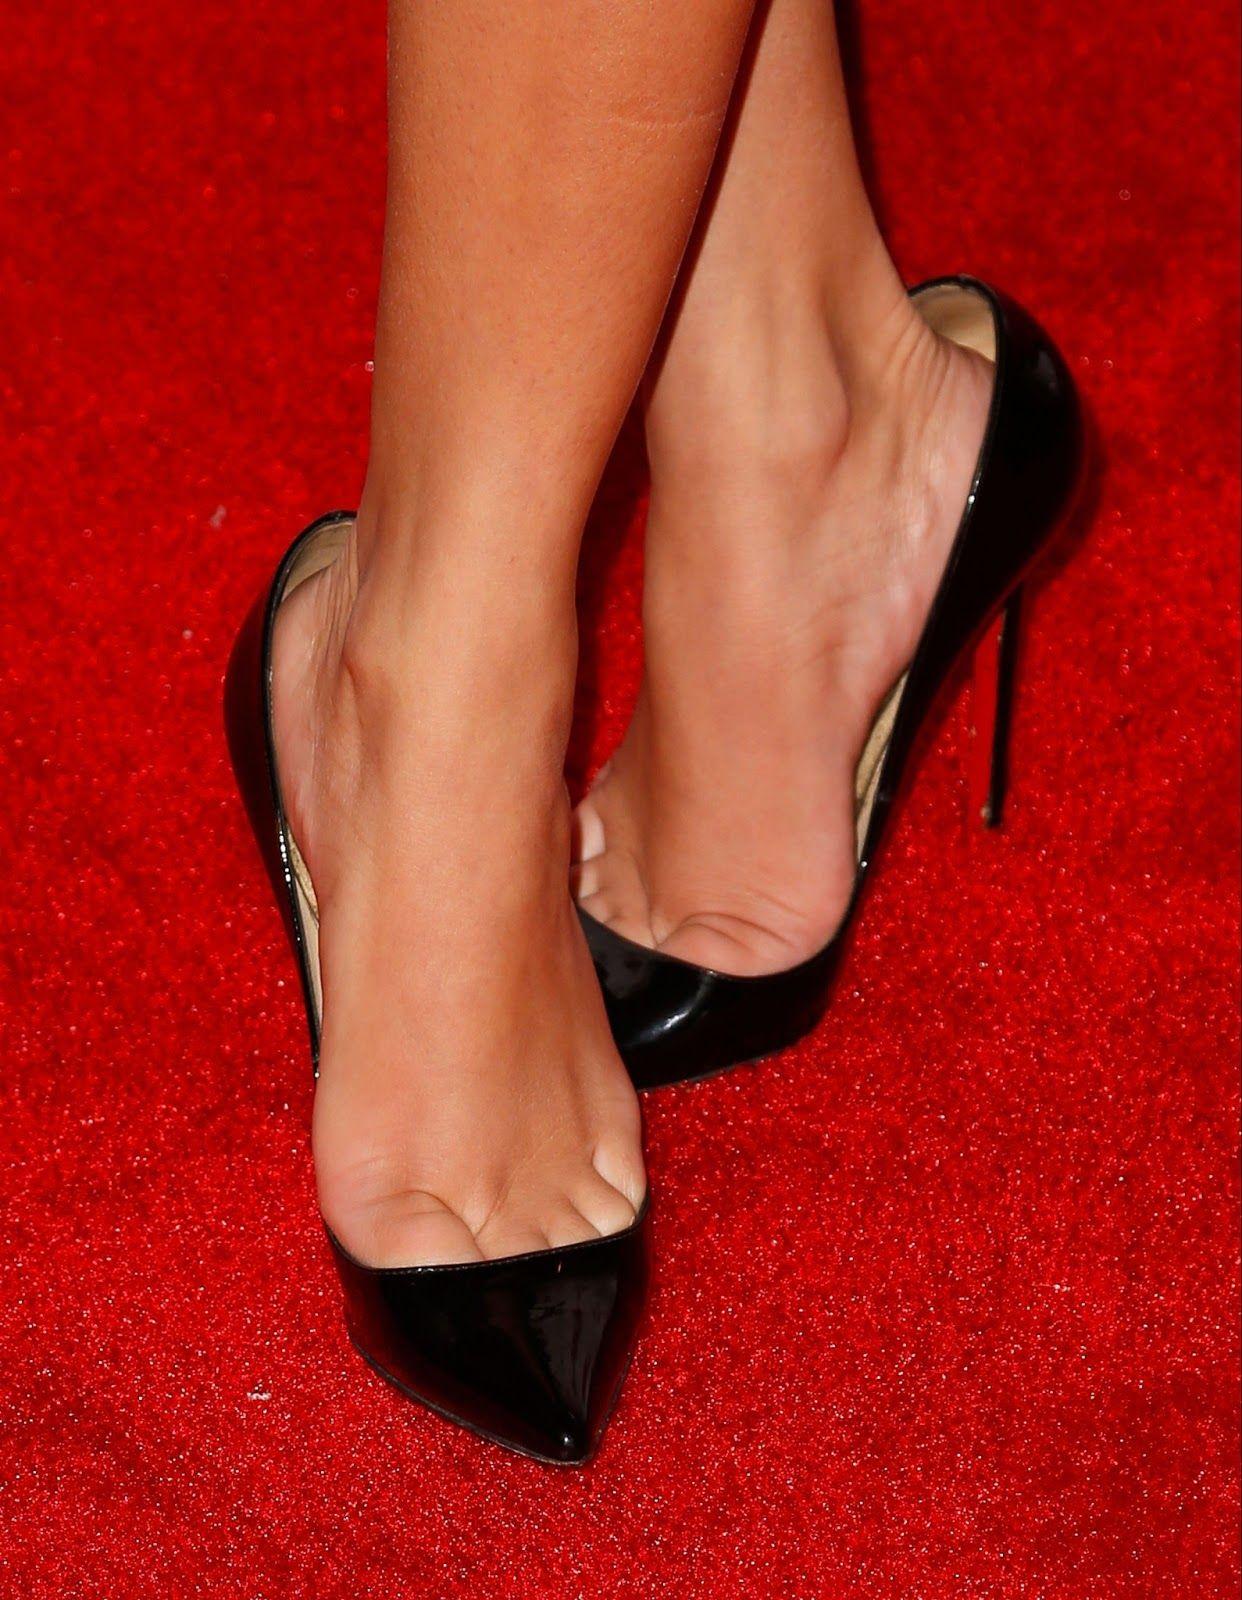 The Toe Cleavage Blog | Toe Cleavage | Pinterest